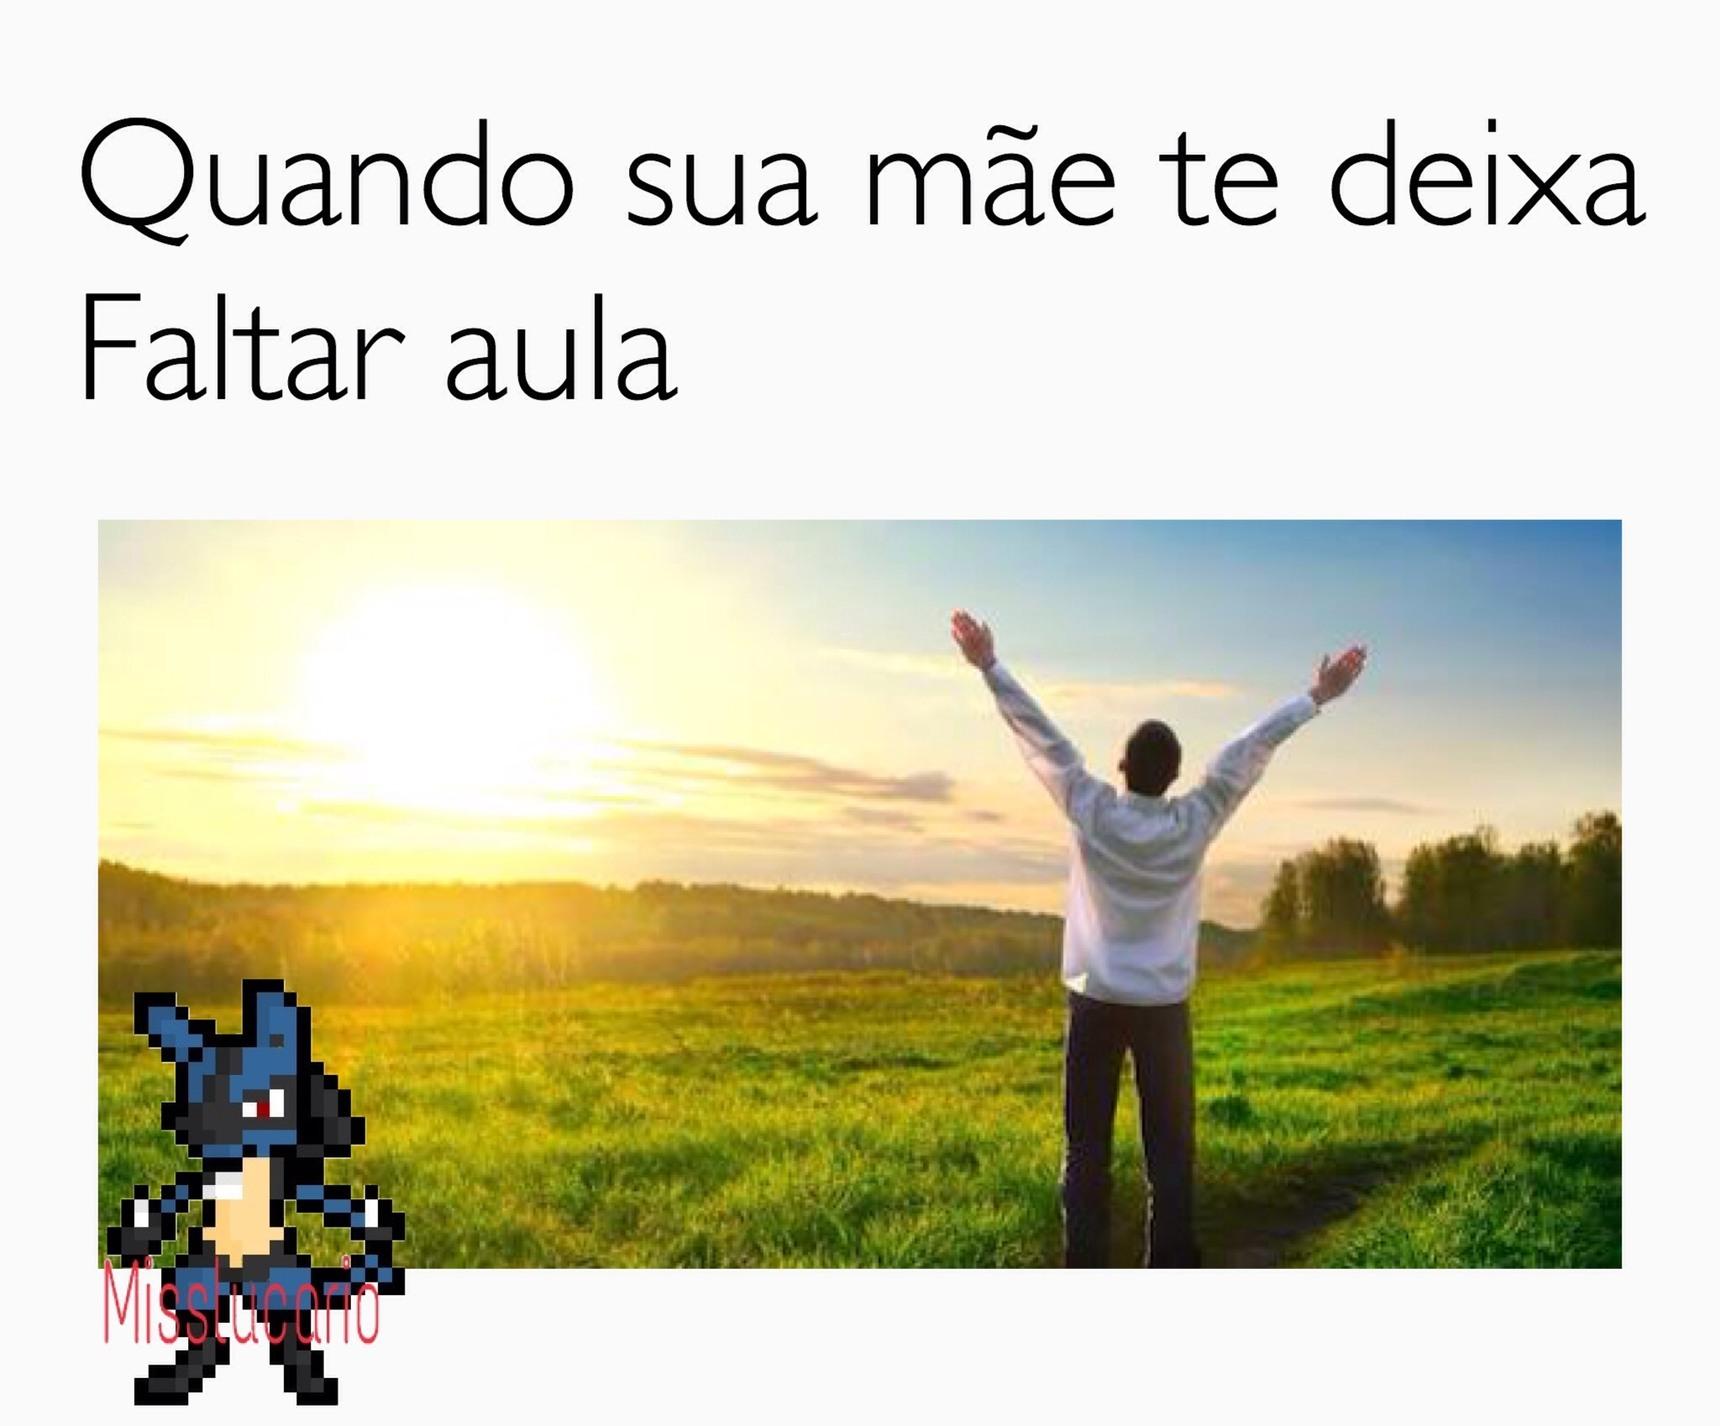 MINHA FOTO NOVA DO PERFIL TA FODA - meme